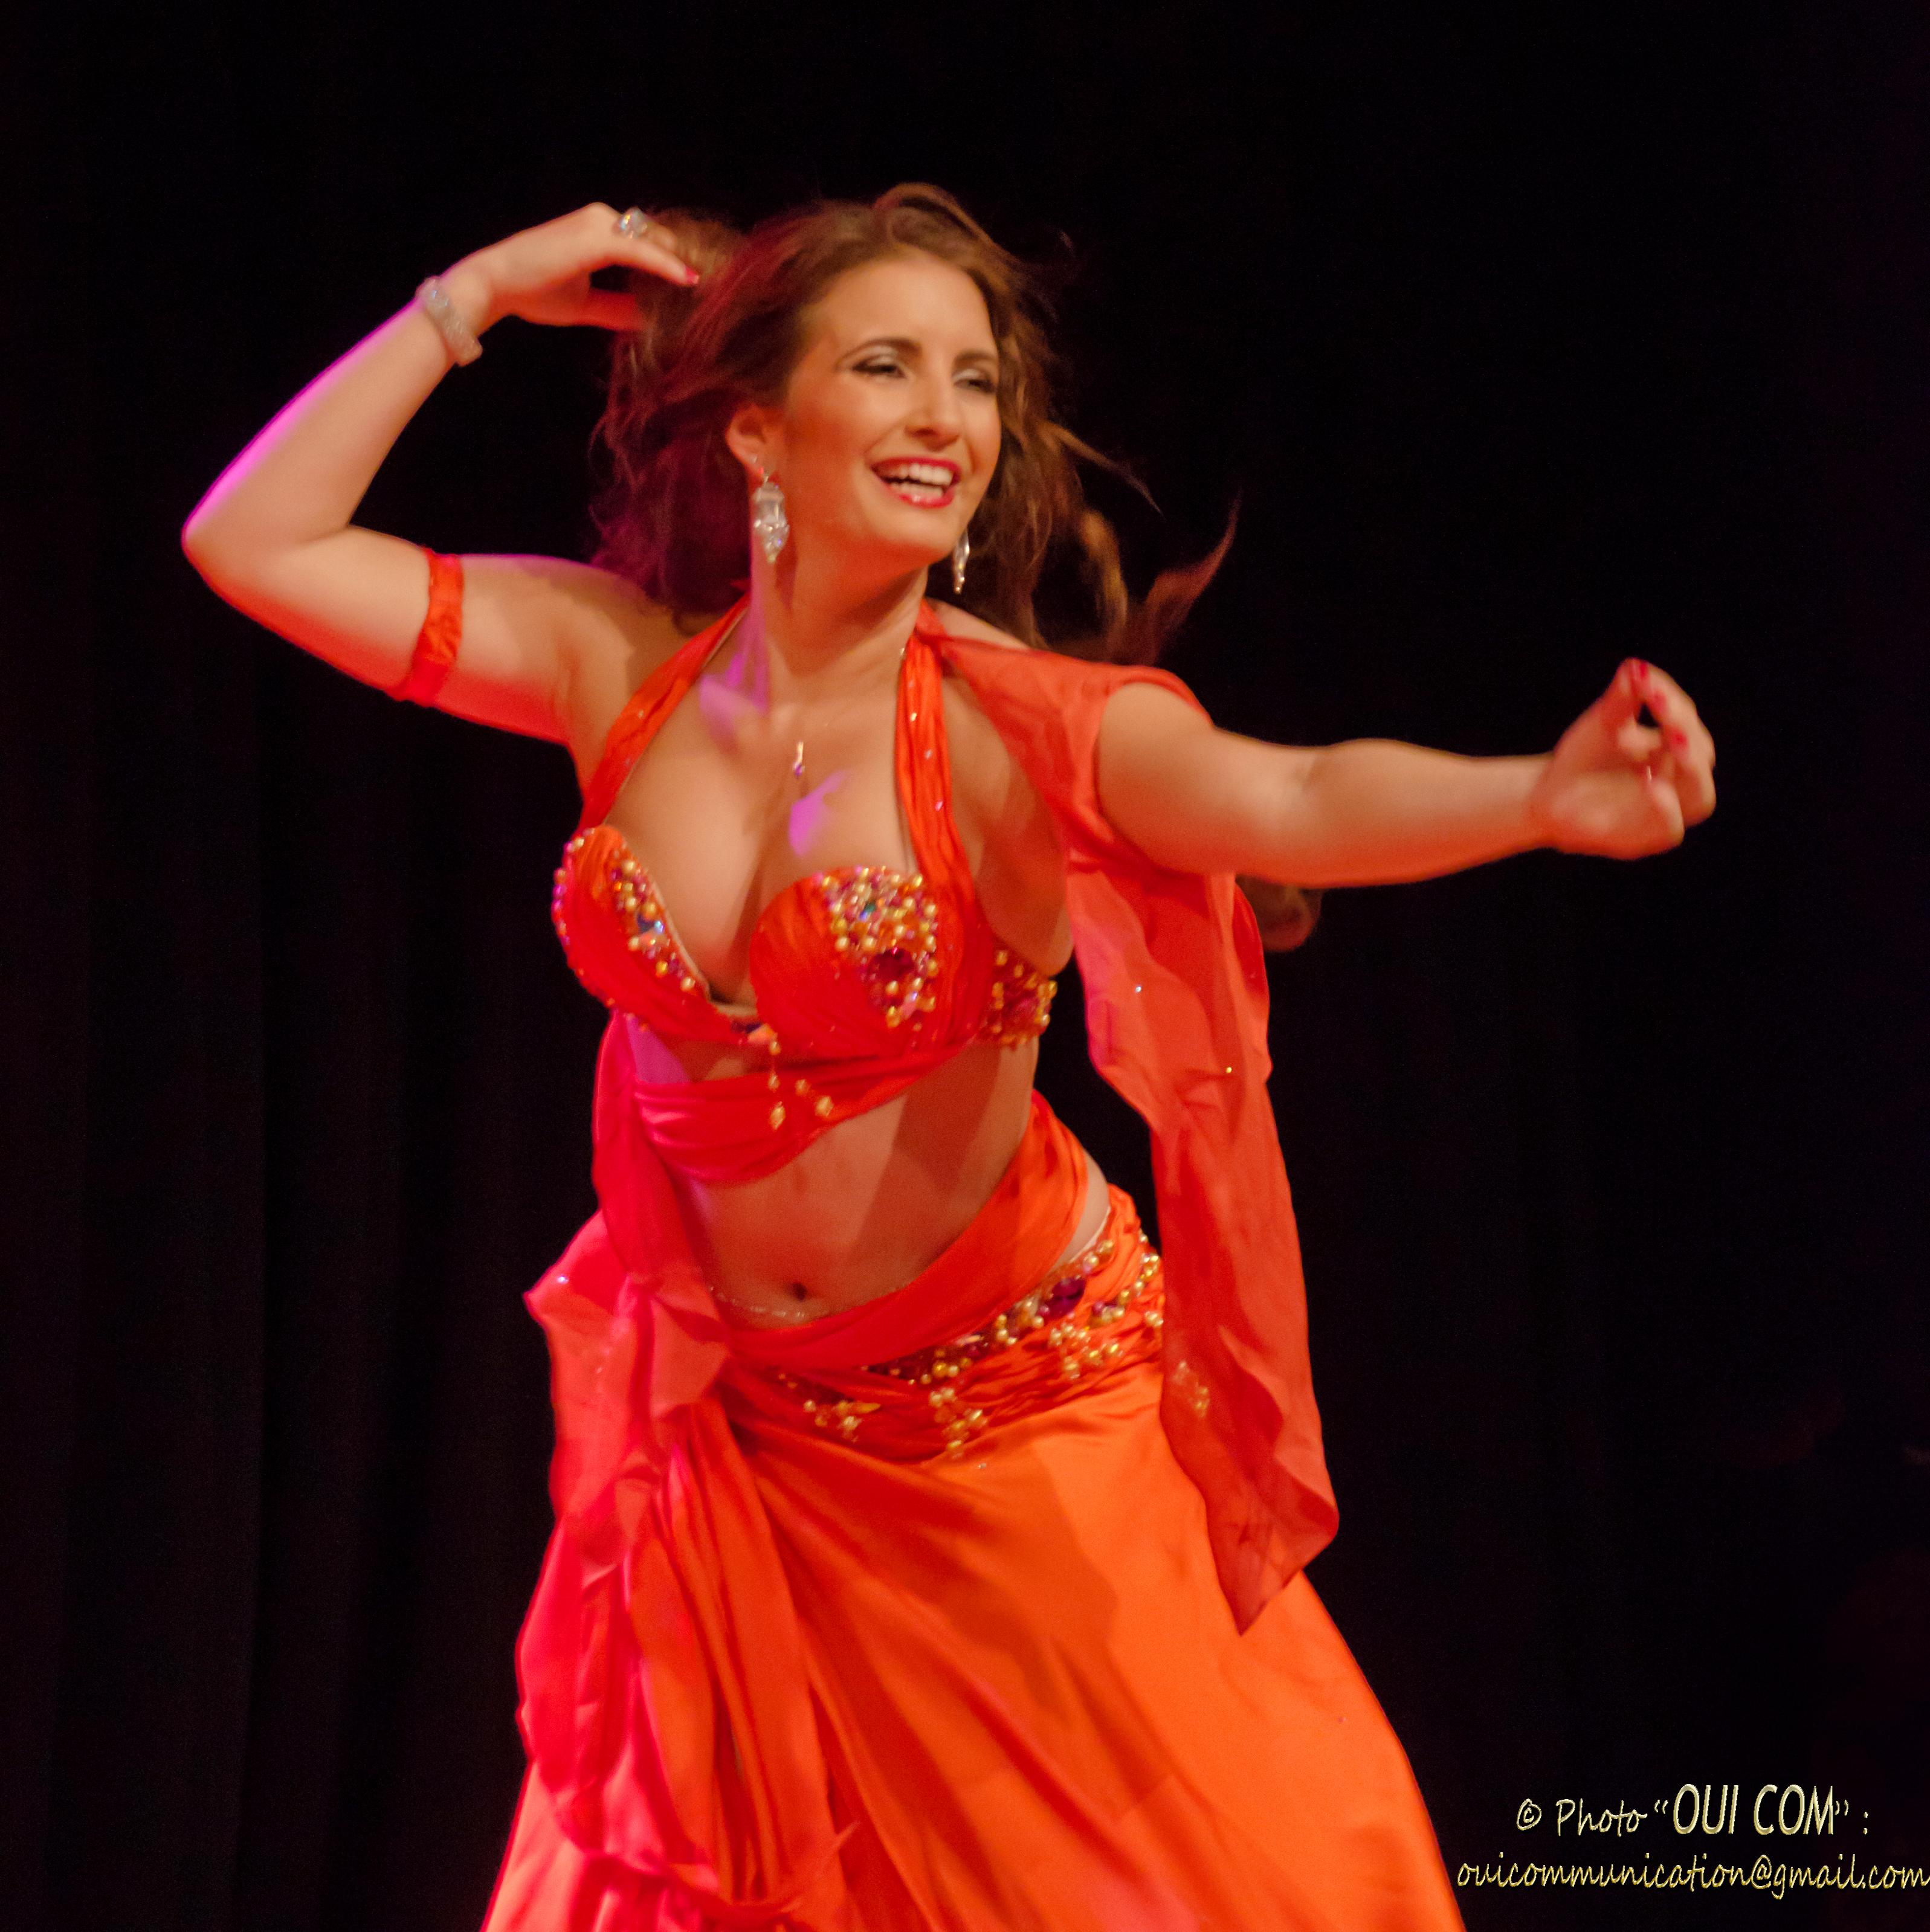 Ecole de danse & cours de danse orientale Paris - Yaël Zarca